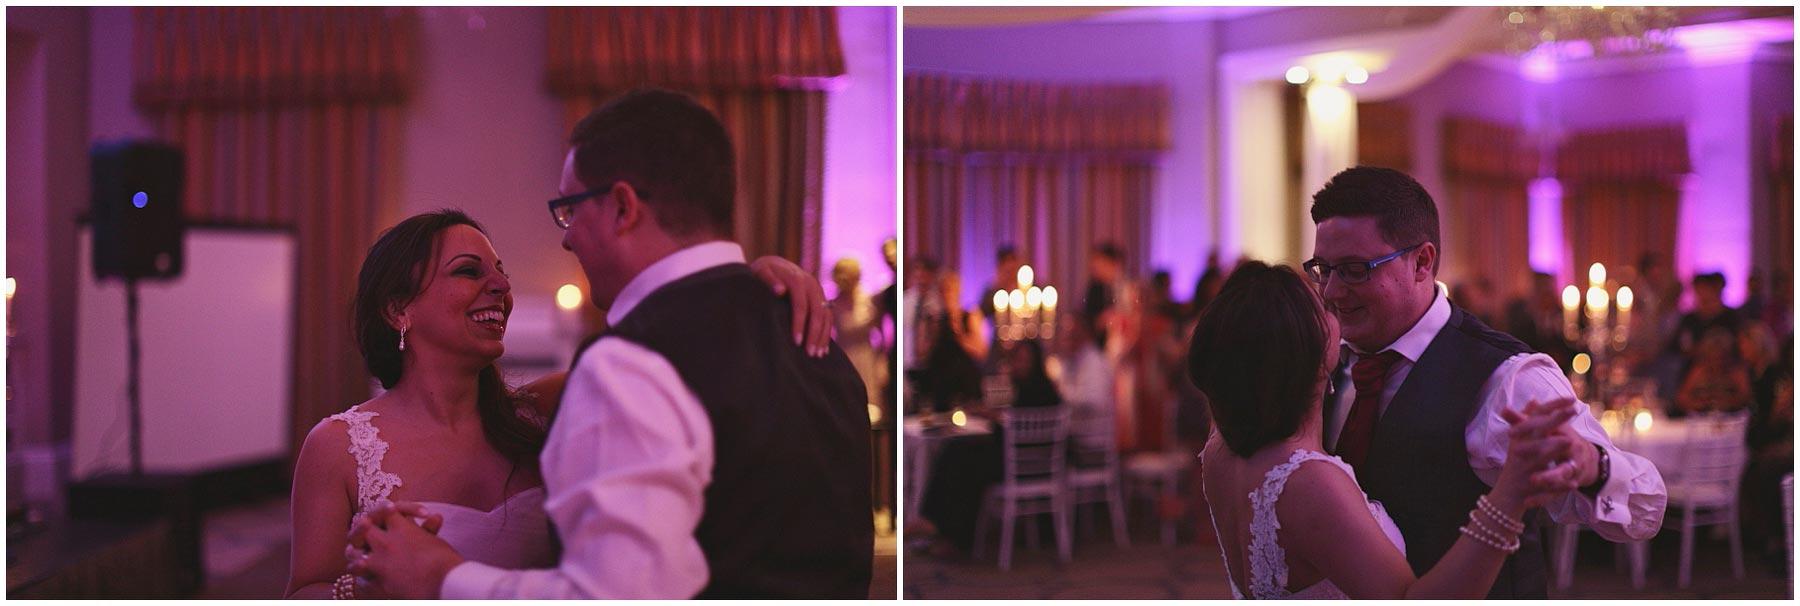 Rudding-Park-Wedding-Photography_0116